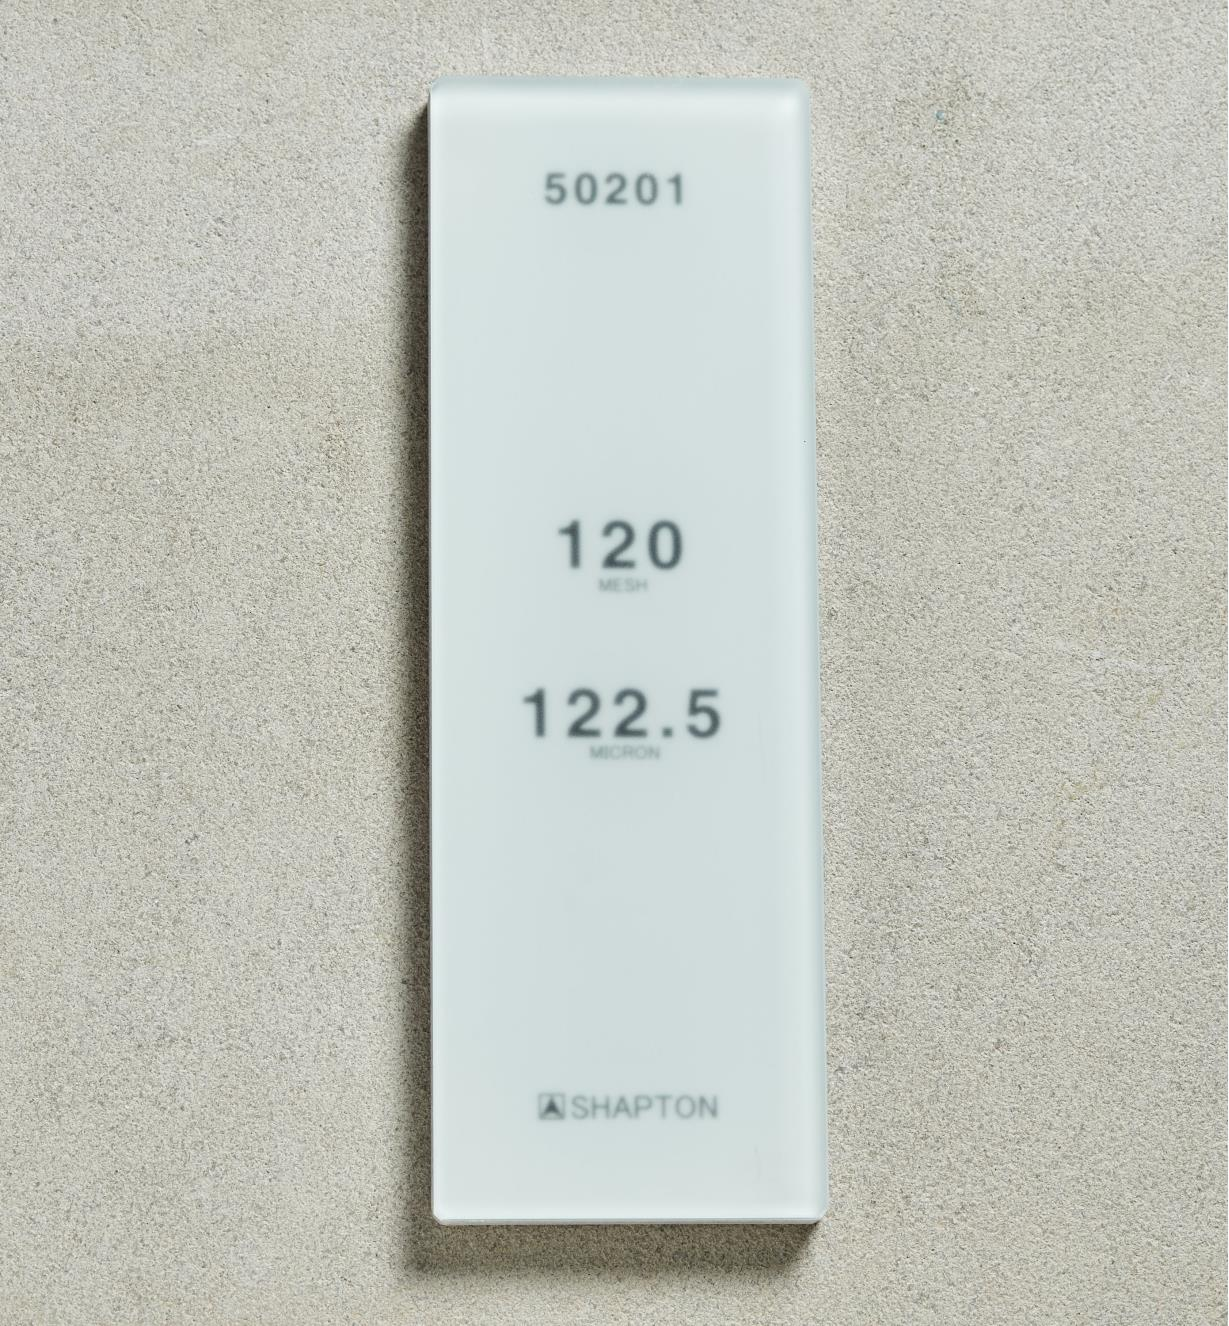 61M0301 - Shapton GlassStone HR Stone 122.50µ 120x